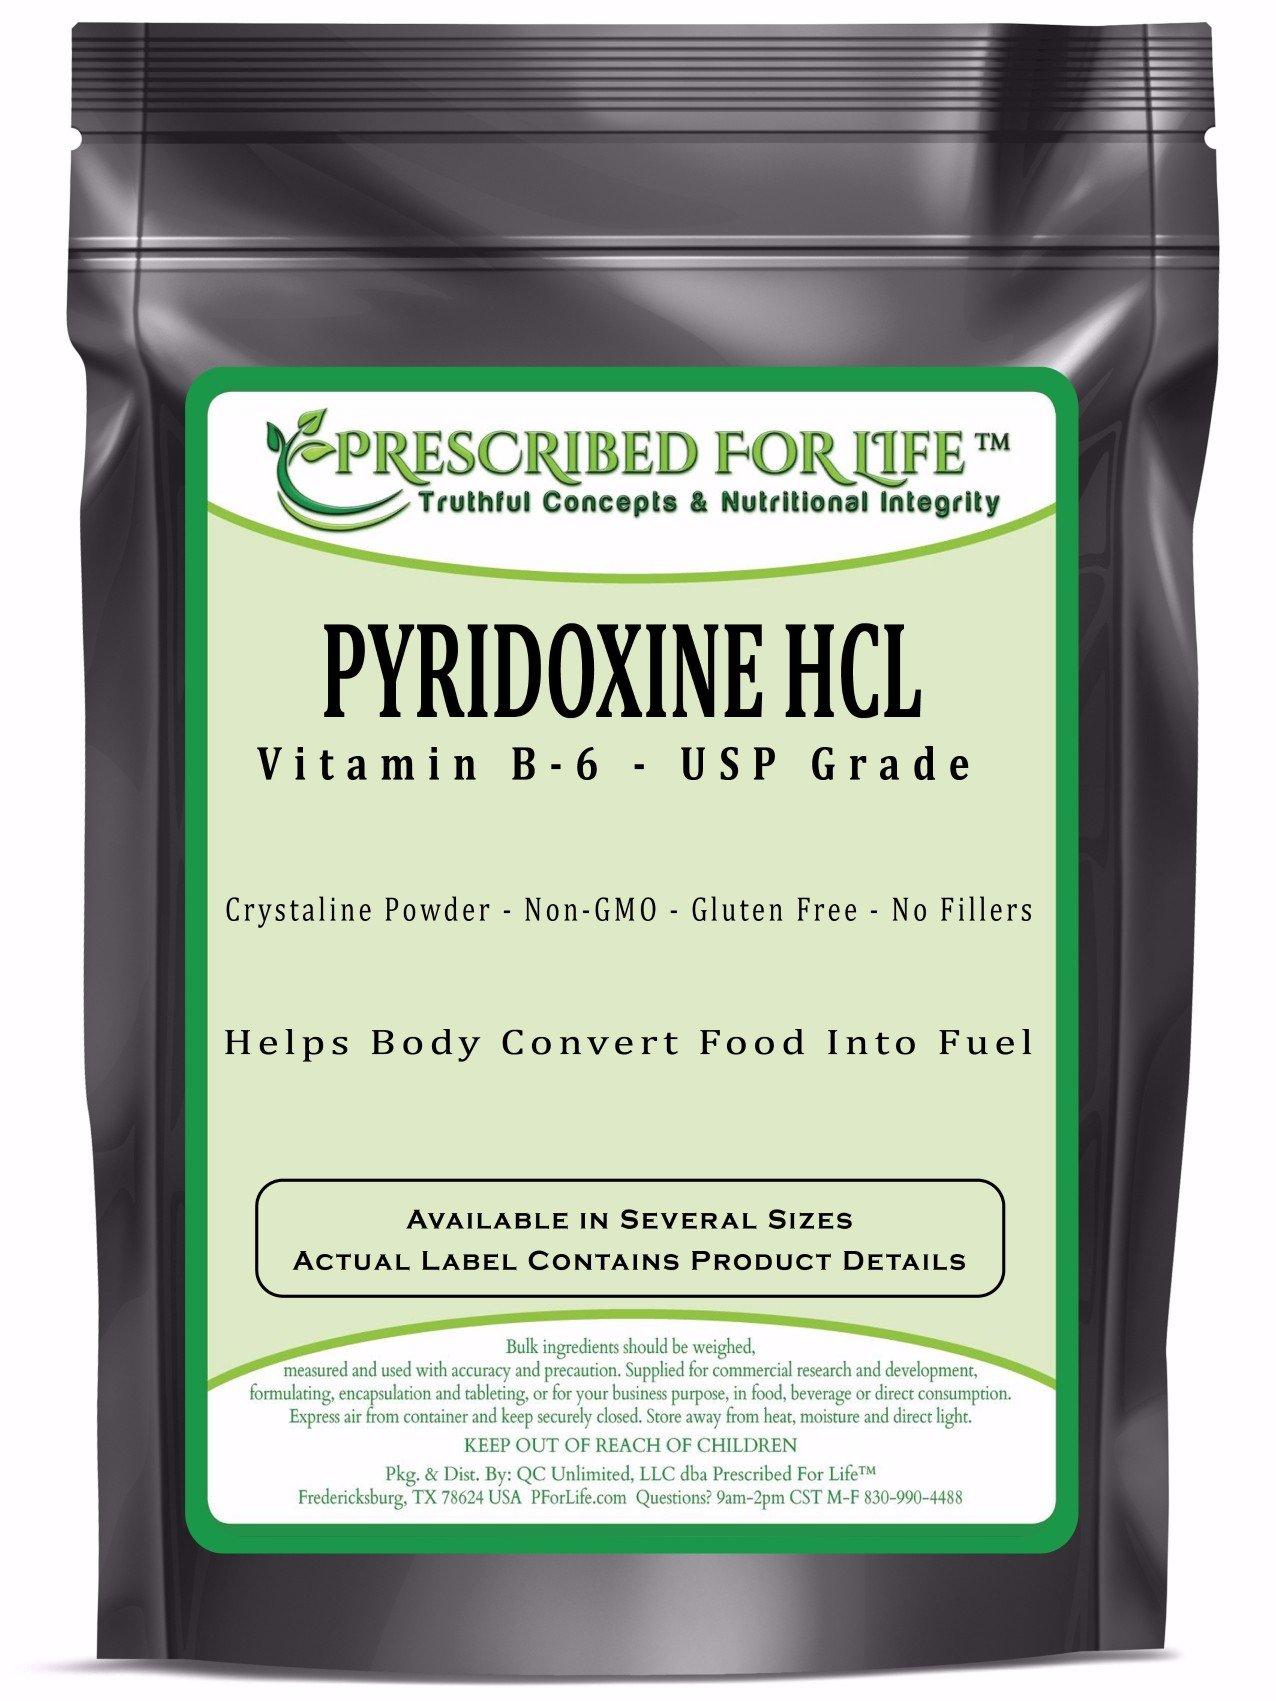 Pyridoxine HCL - USP Food Grade Vitamin B-6 Powder, 1 kg by Prescribed For Life